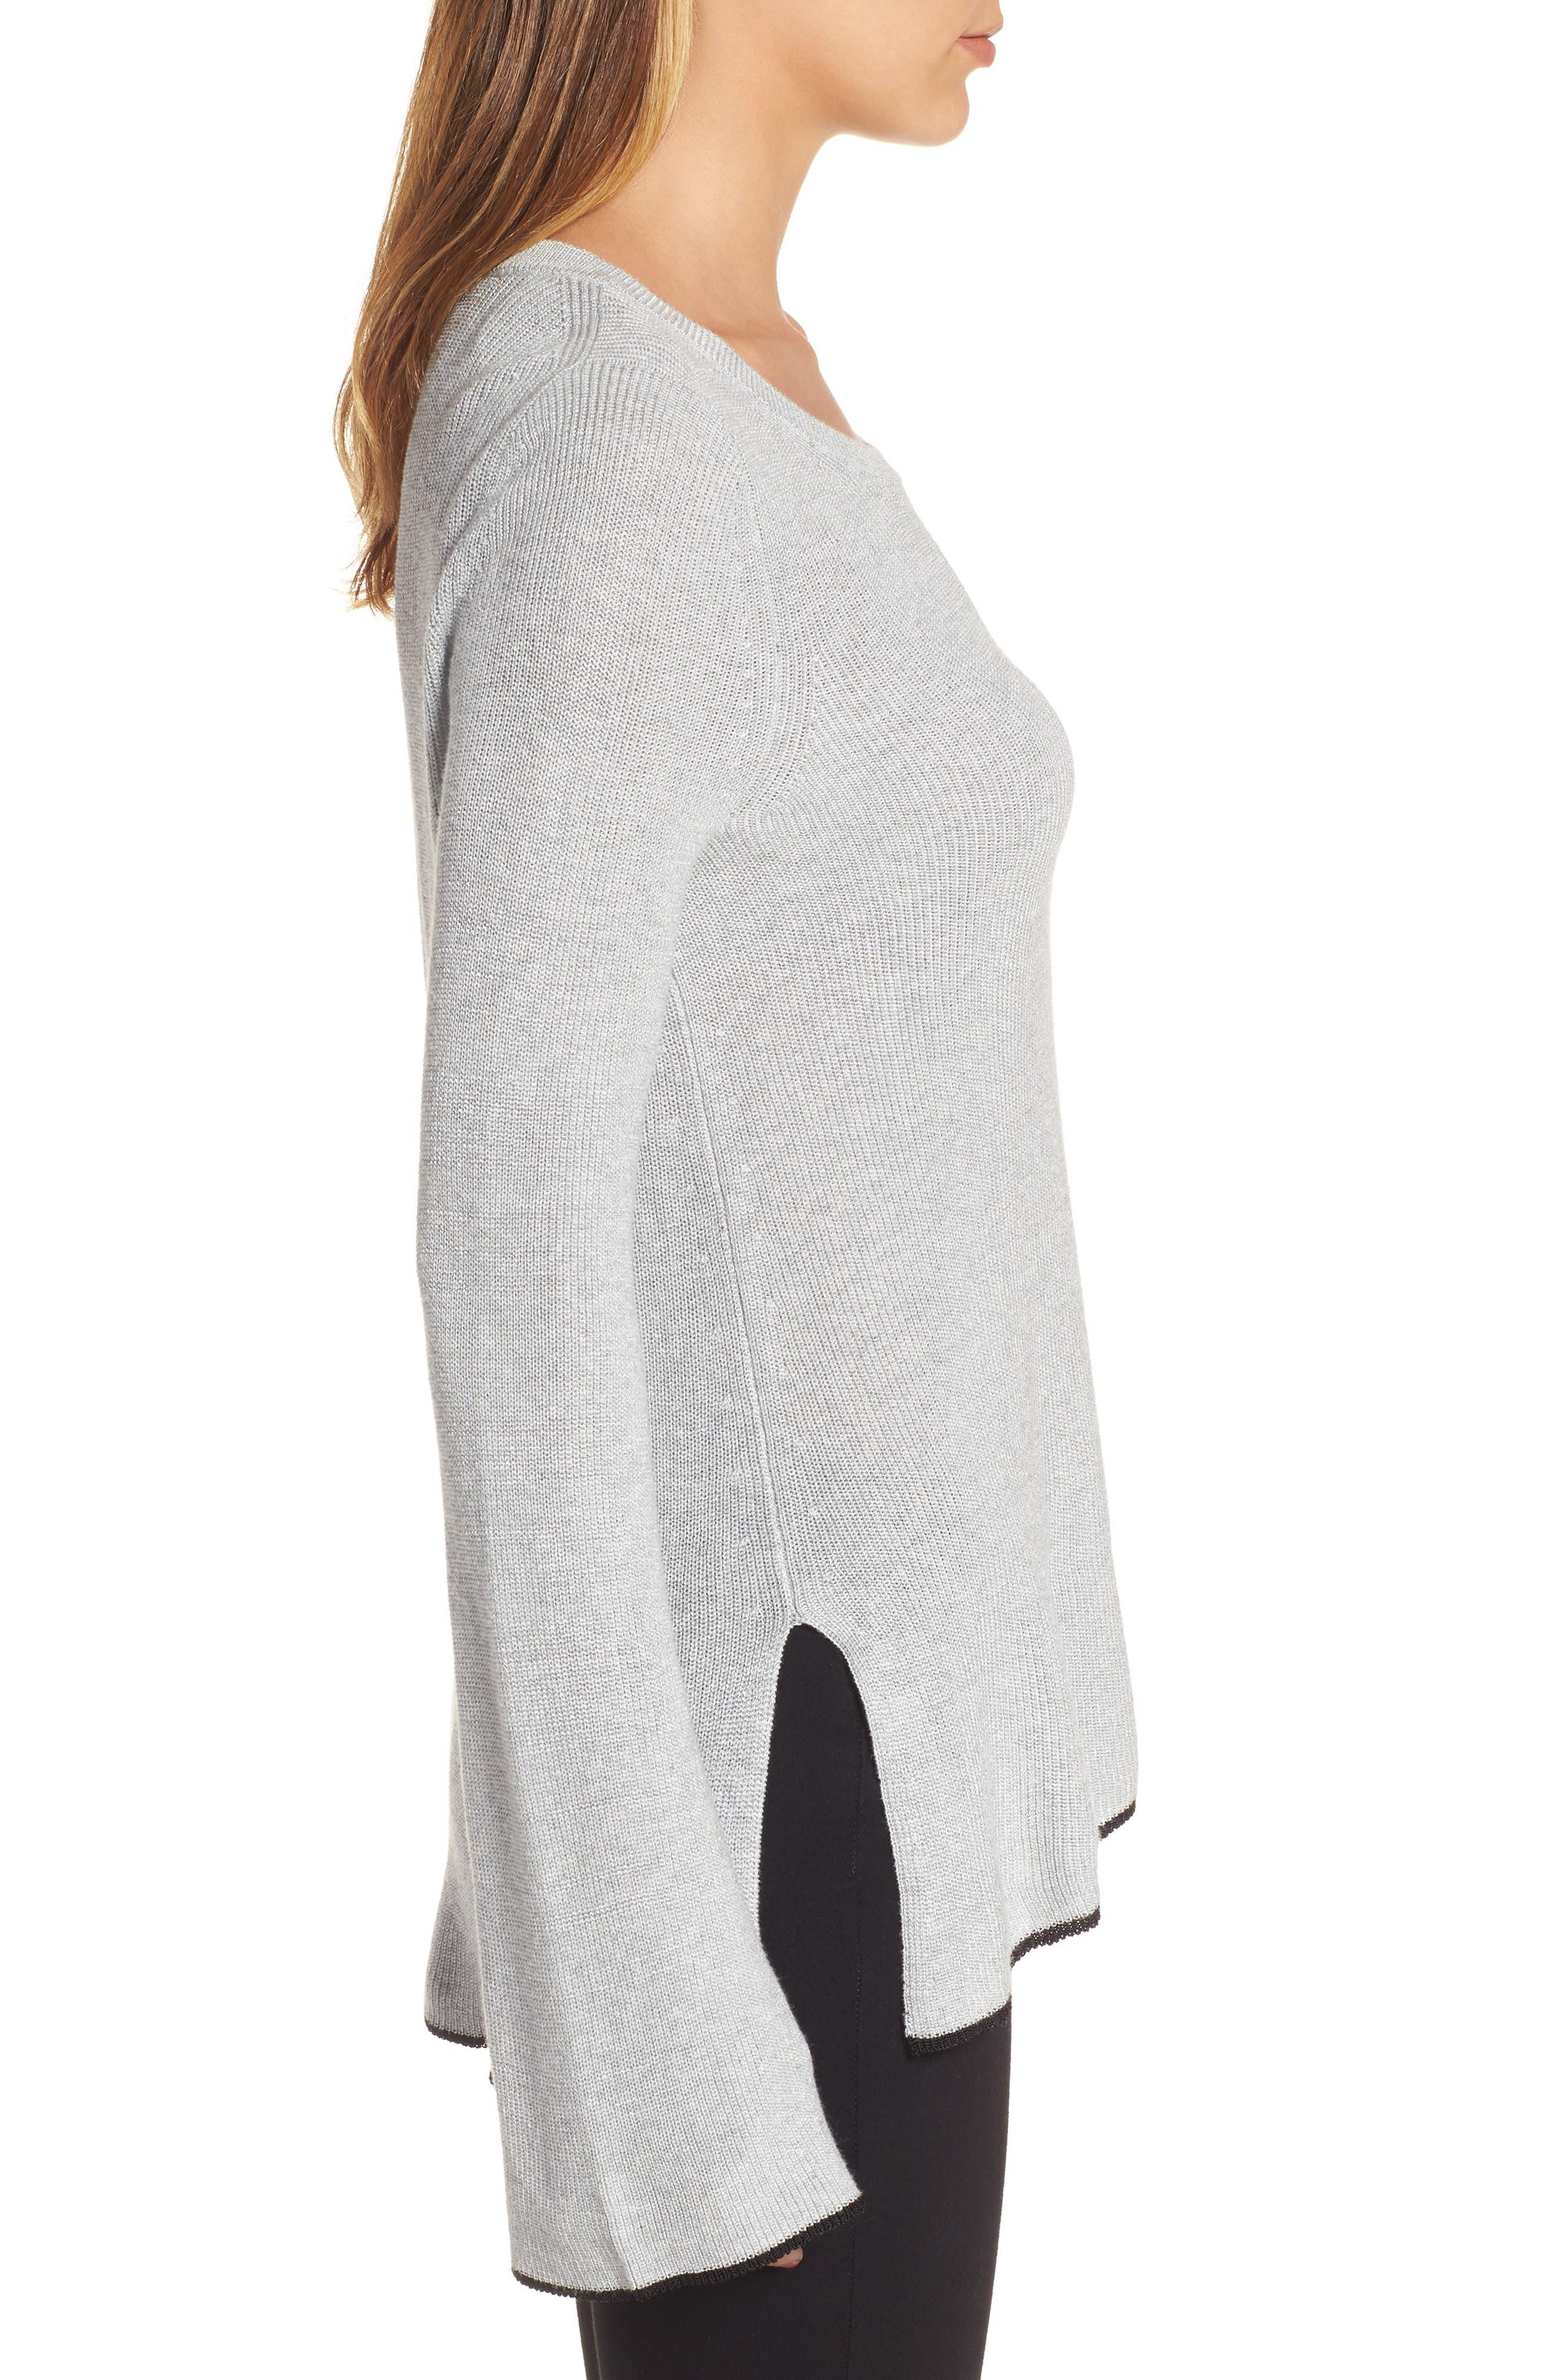 Alternate Image 3  - Vince Camuto Tipped Bell Sleeve Sweater (Regular & Petite)